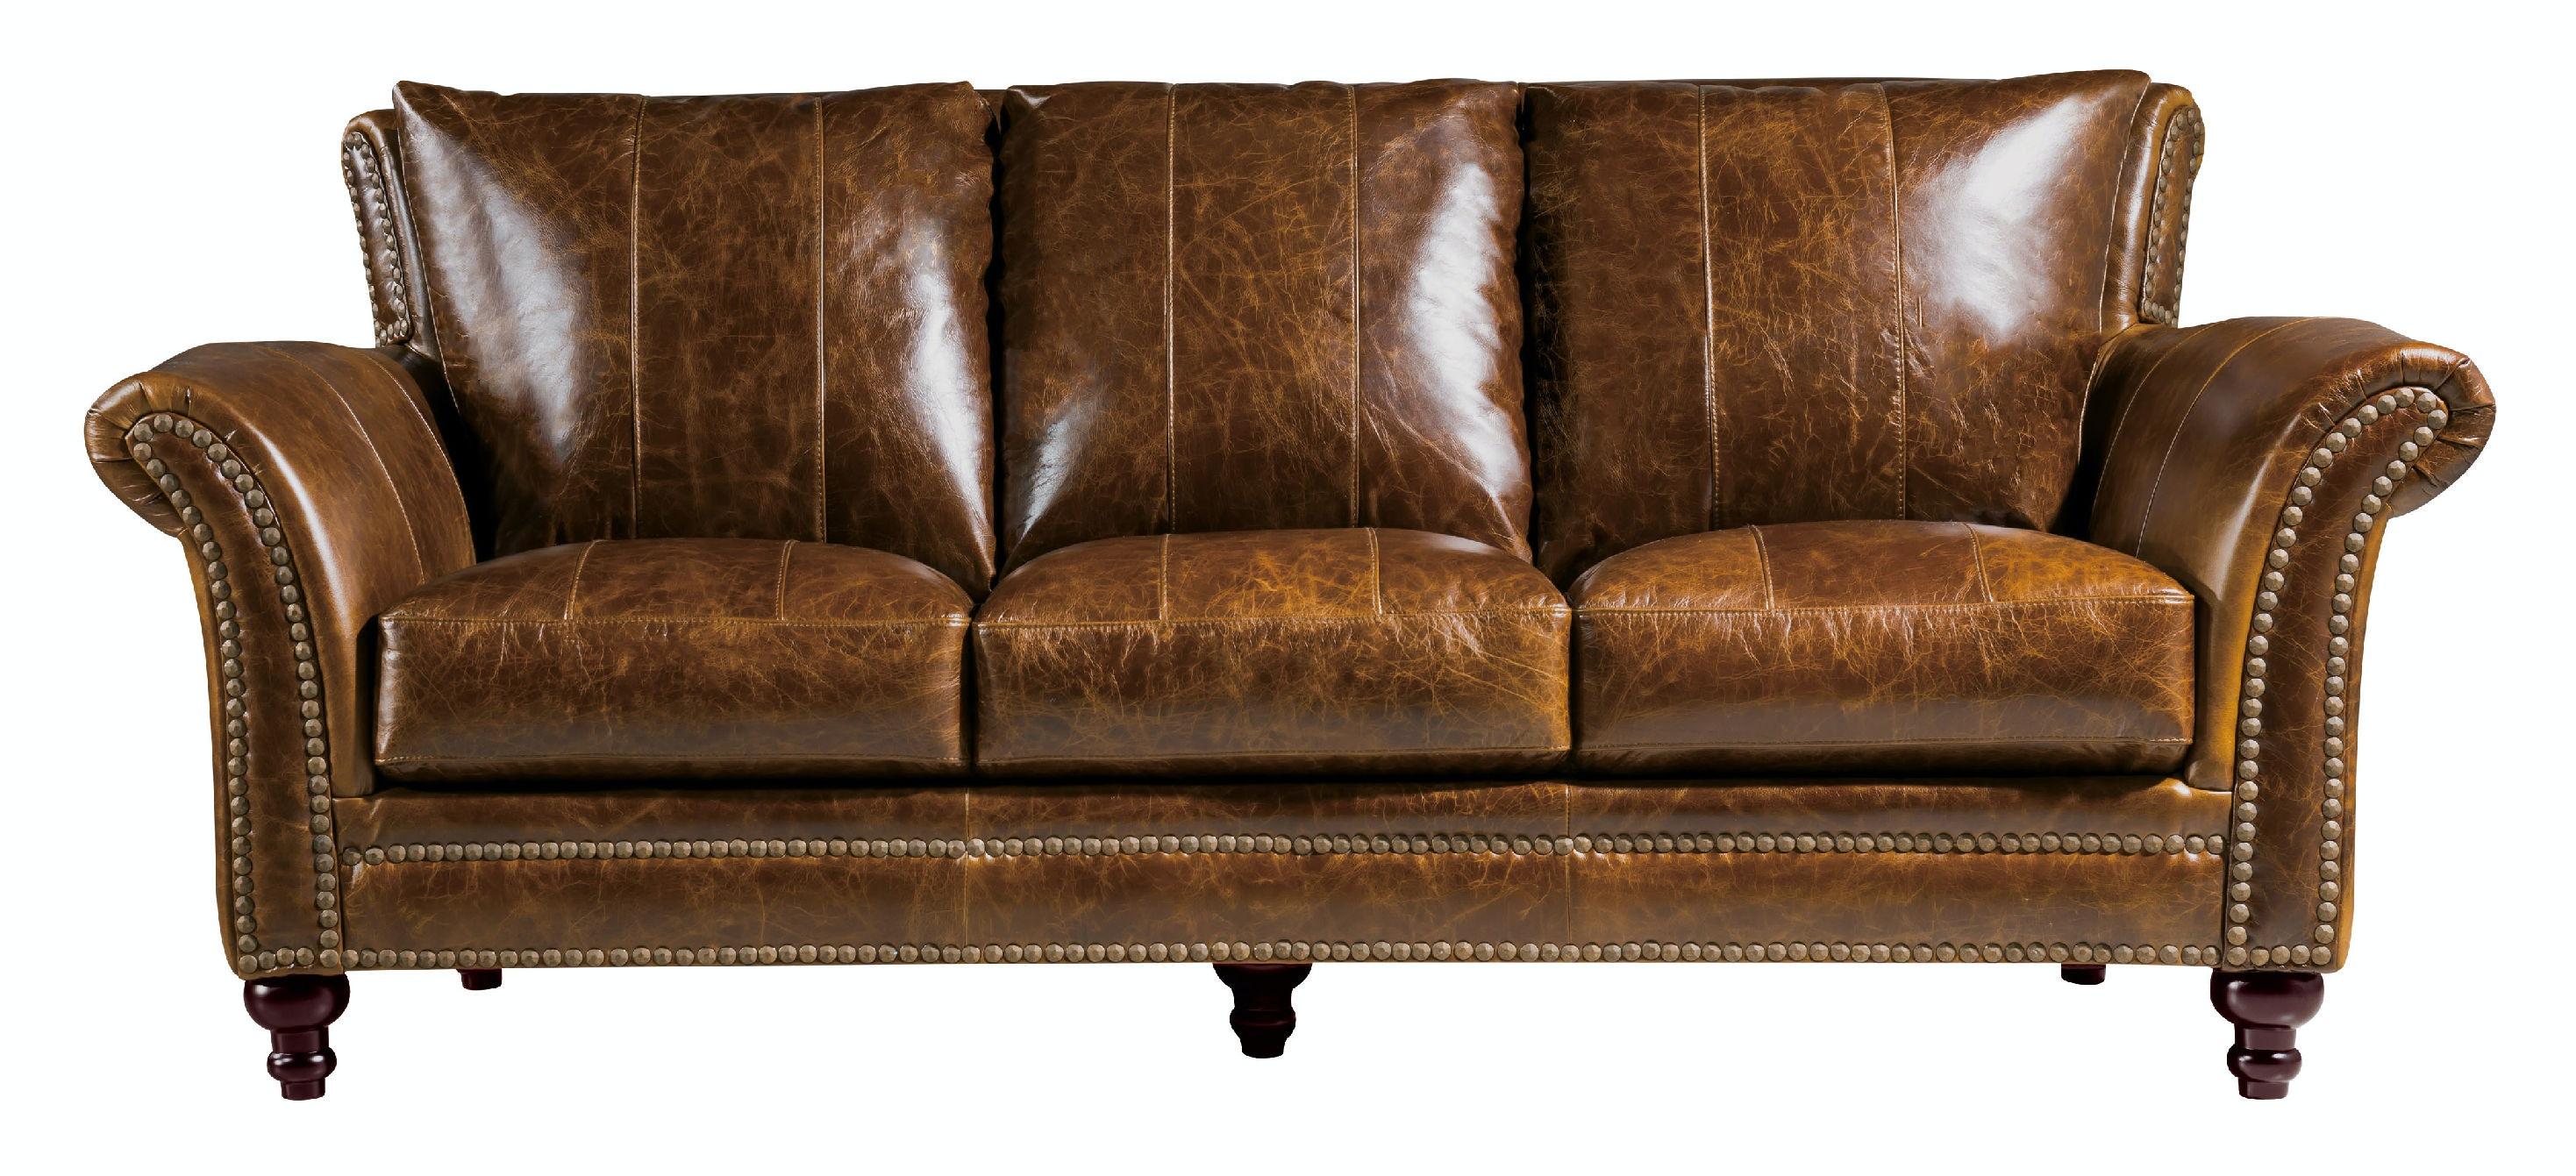 sofas unlimited mechanicsburg pa good value sofa brands leather italia living room butler 1669 2239 035507